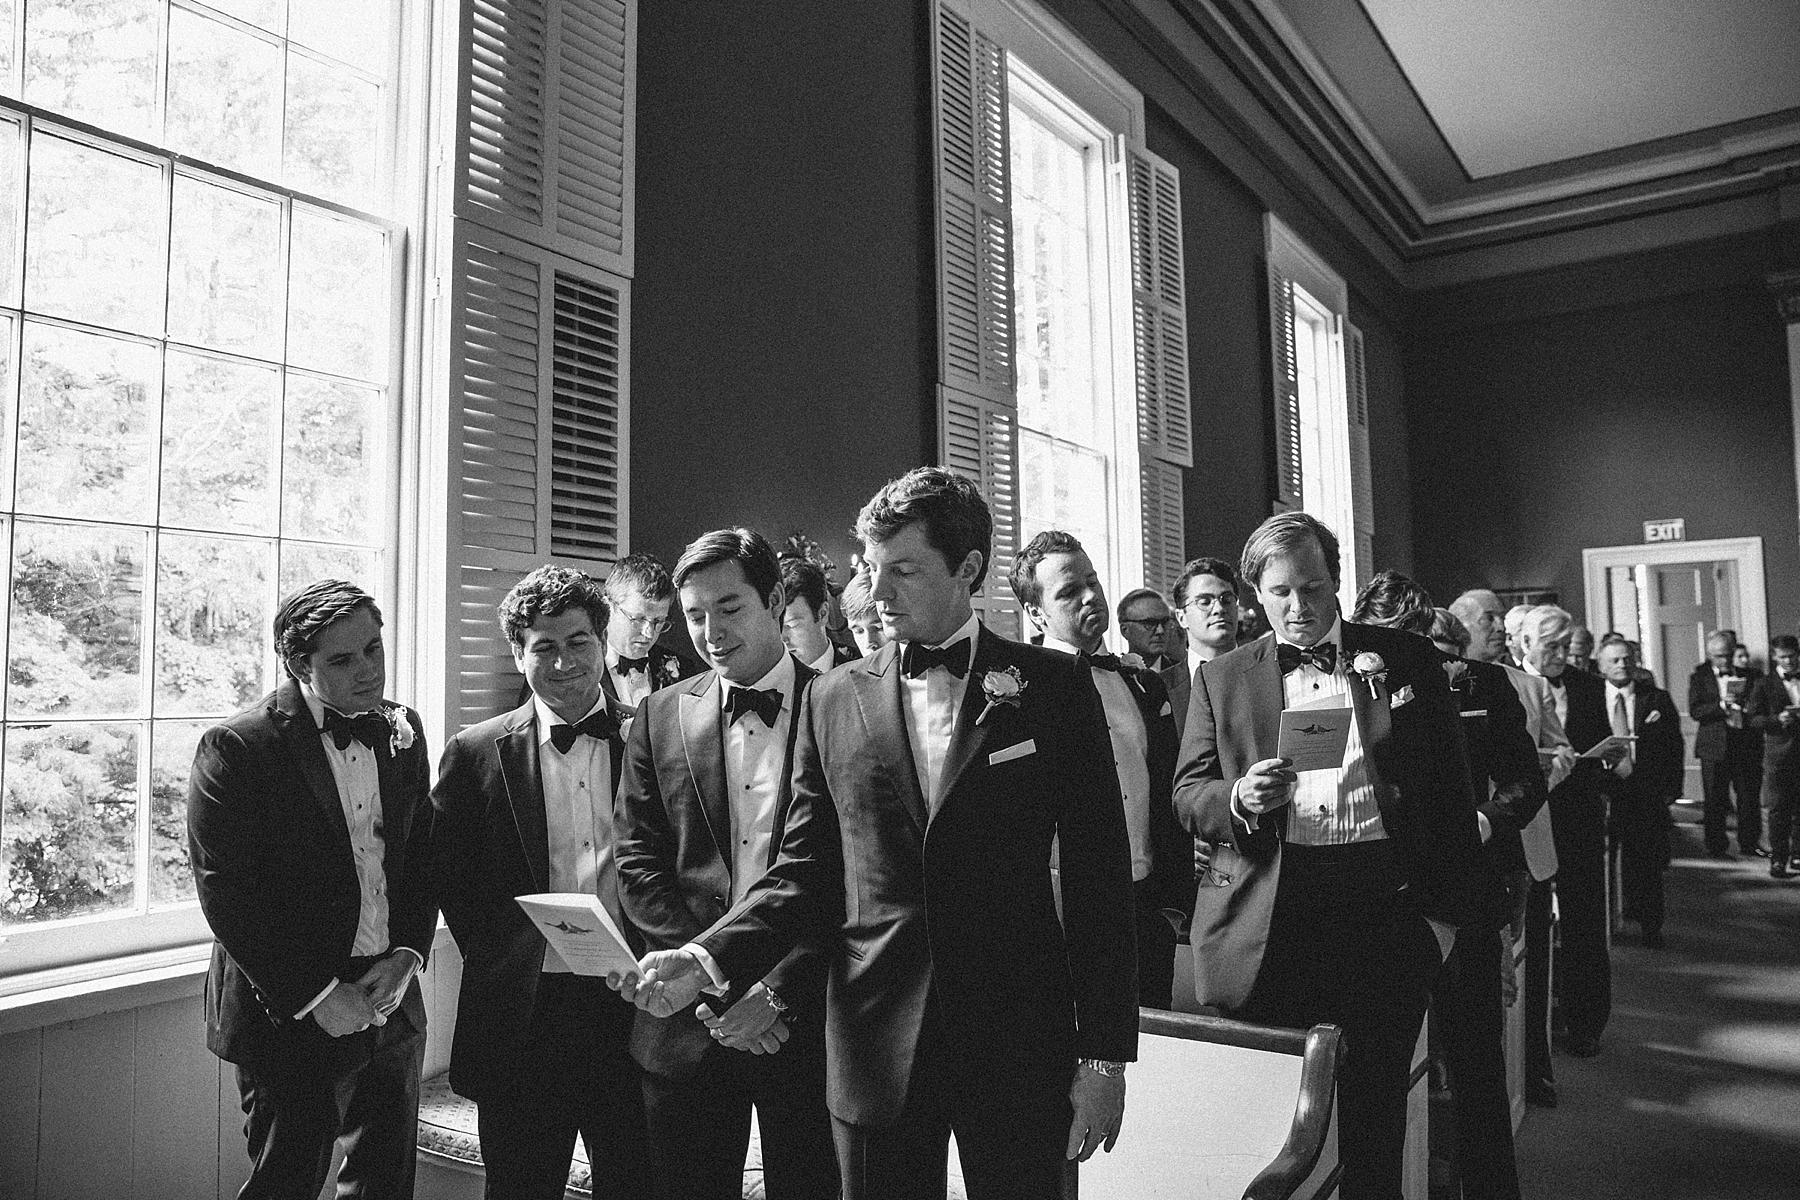 mashomack-preserve-polo-club-wedding-ny-photographer_0046.jpg